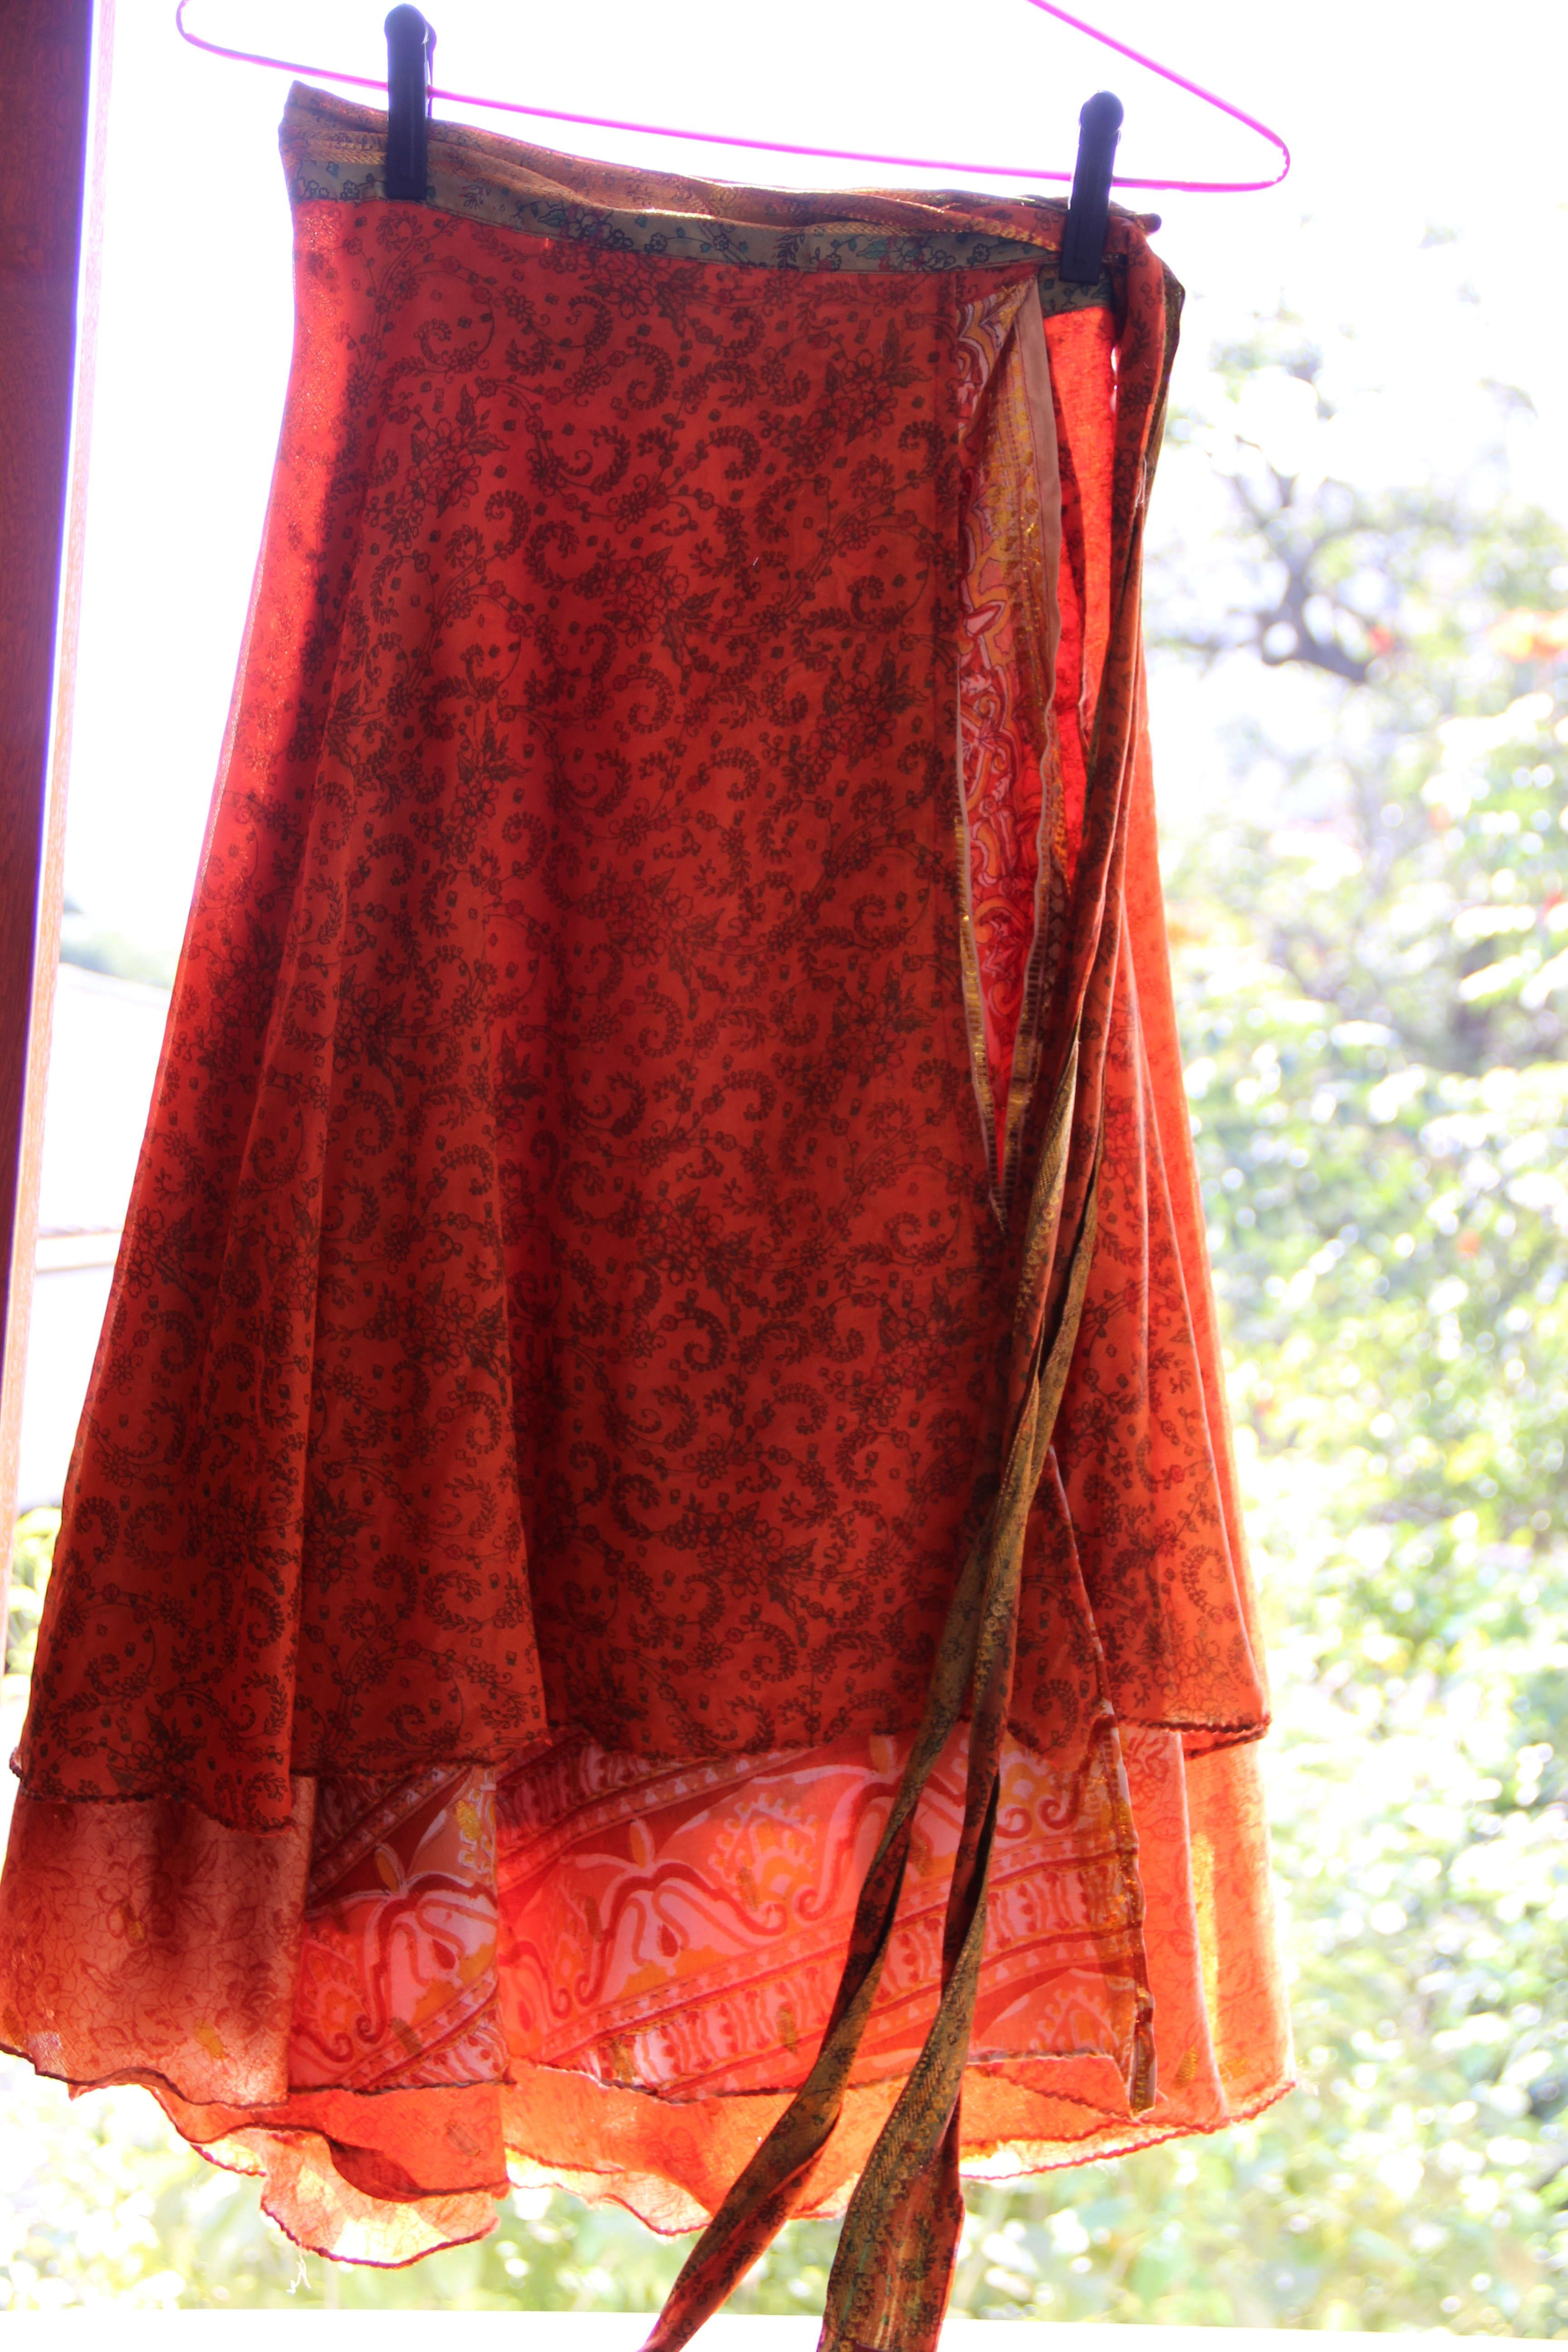 1ad442668 Saia ou vestido de seda indiana